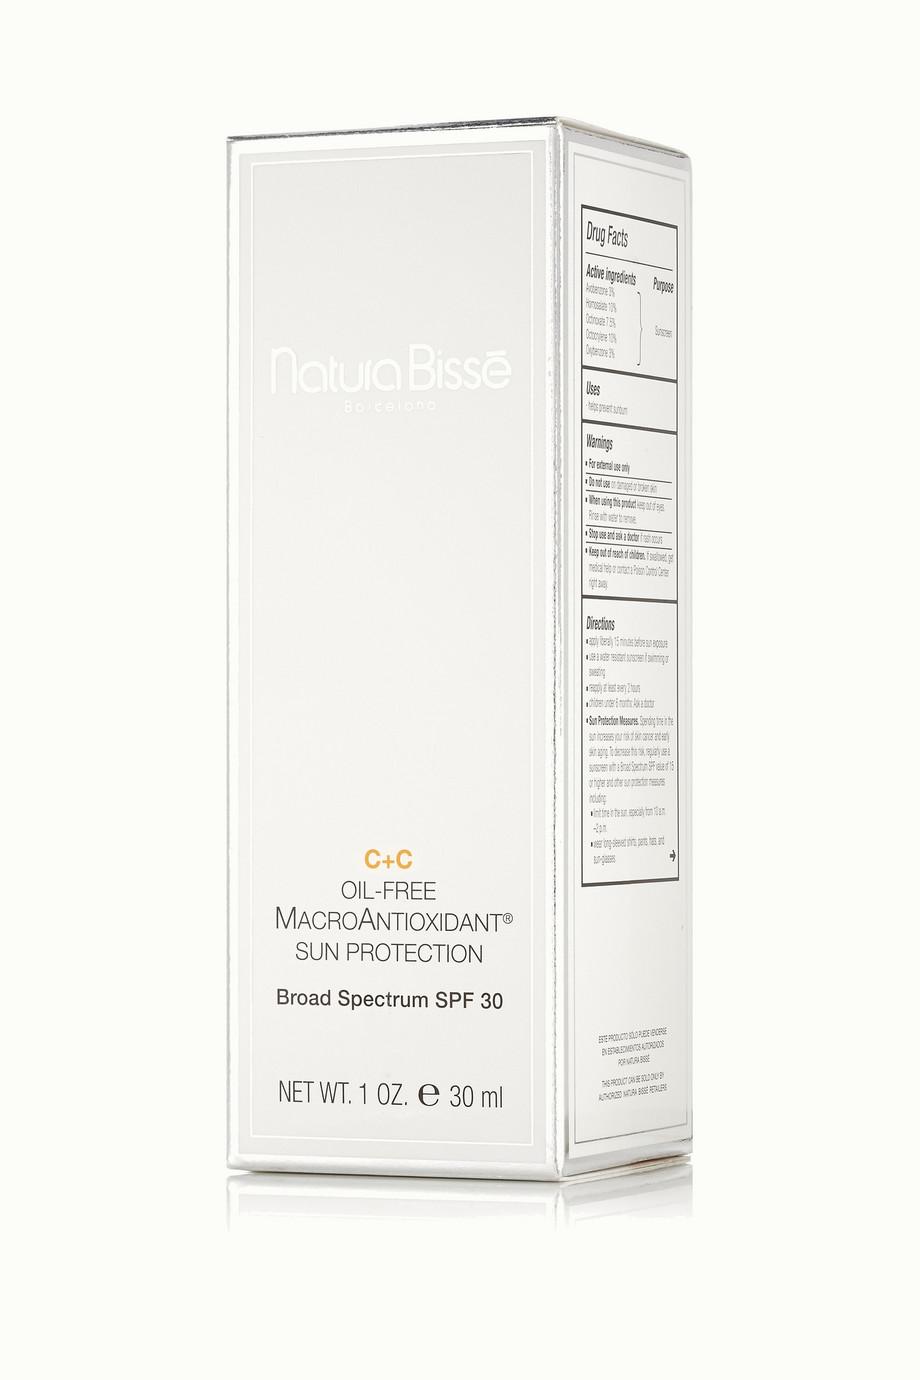 Natura Bissé C+C Oil-Free MacroAntioxidant Sun Protection LSF 30, 30 ml – Sonnencreme